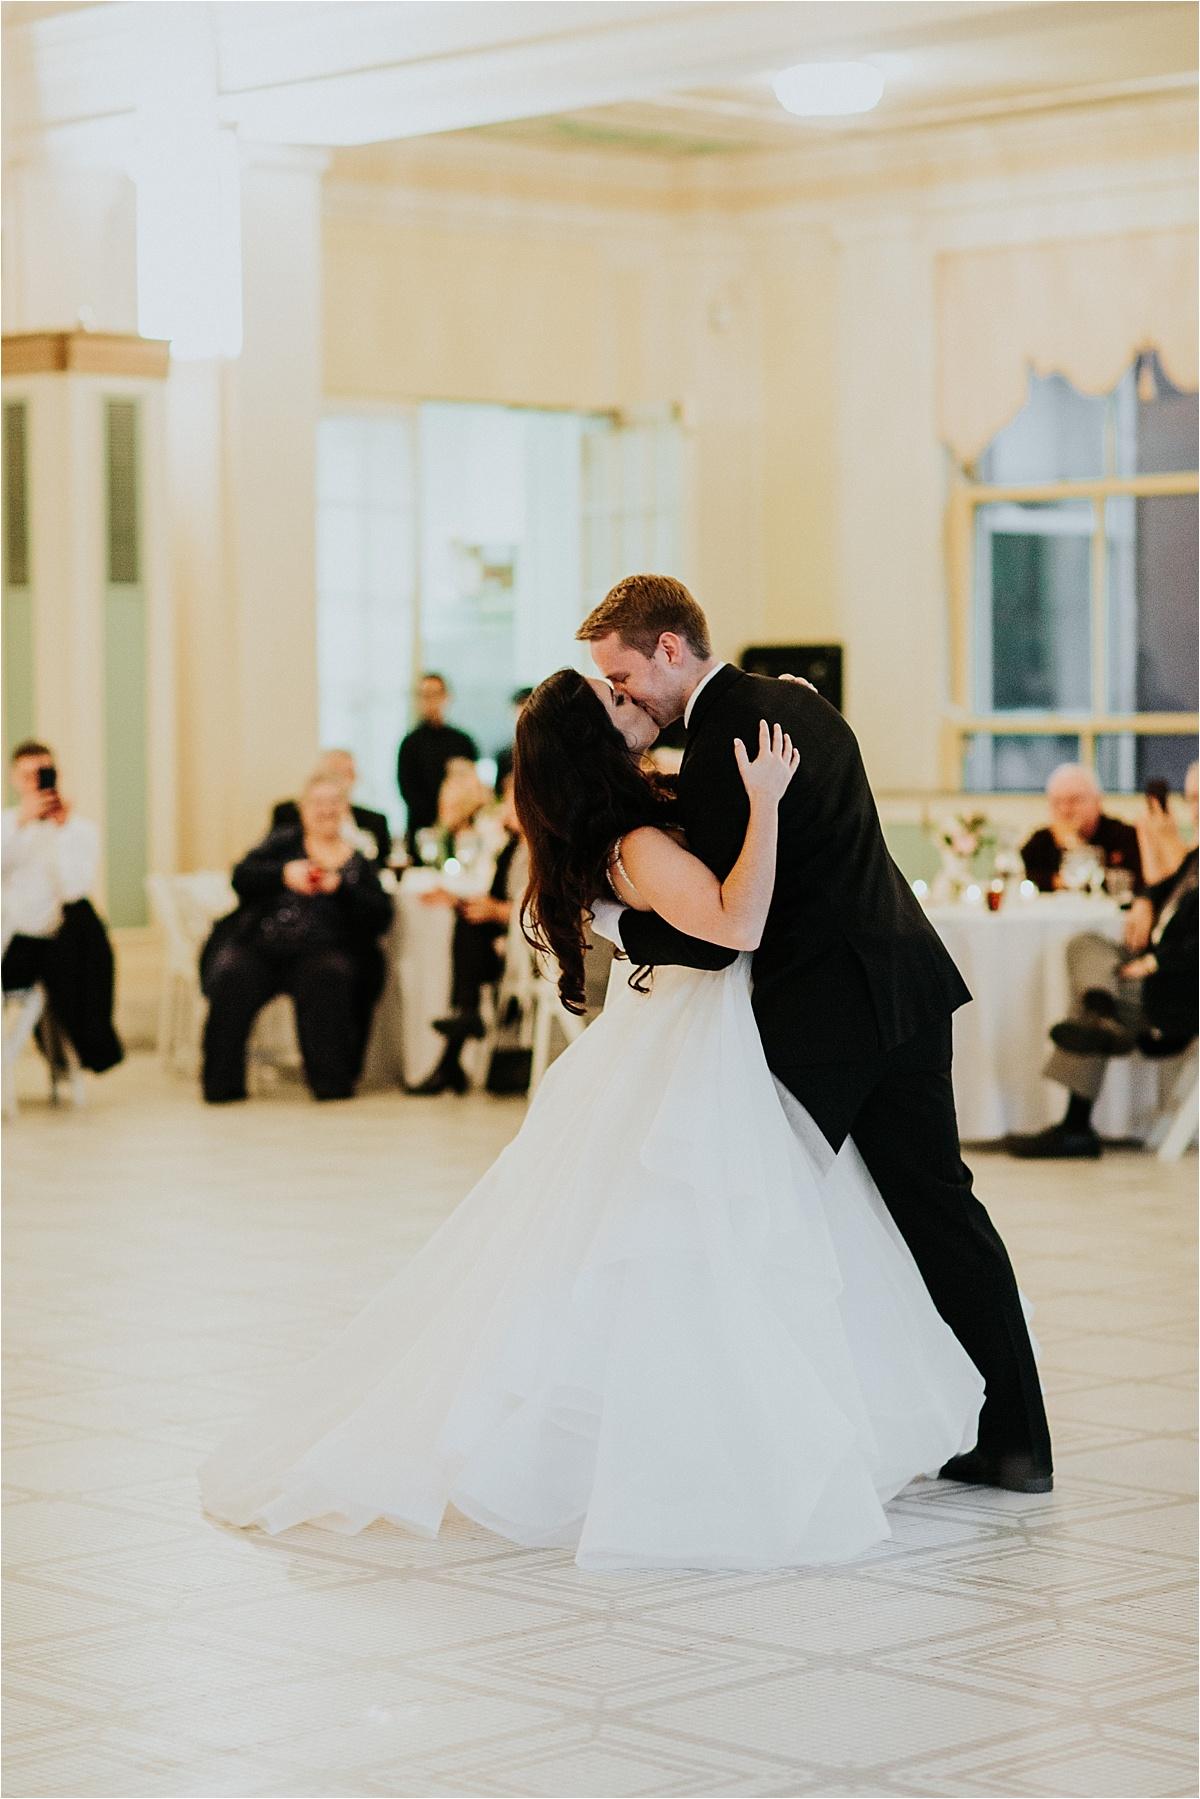 South Shore Cultural Center Wedding 200_0631.jpg